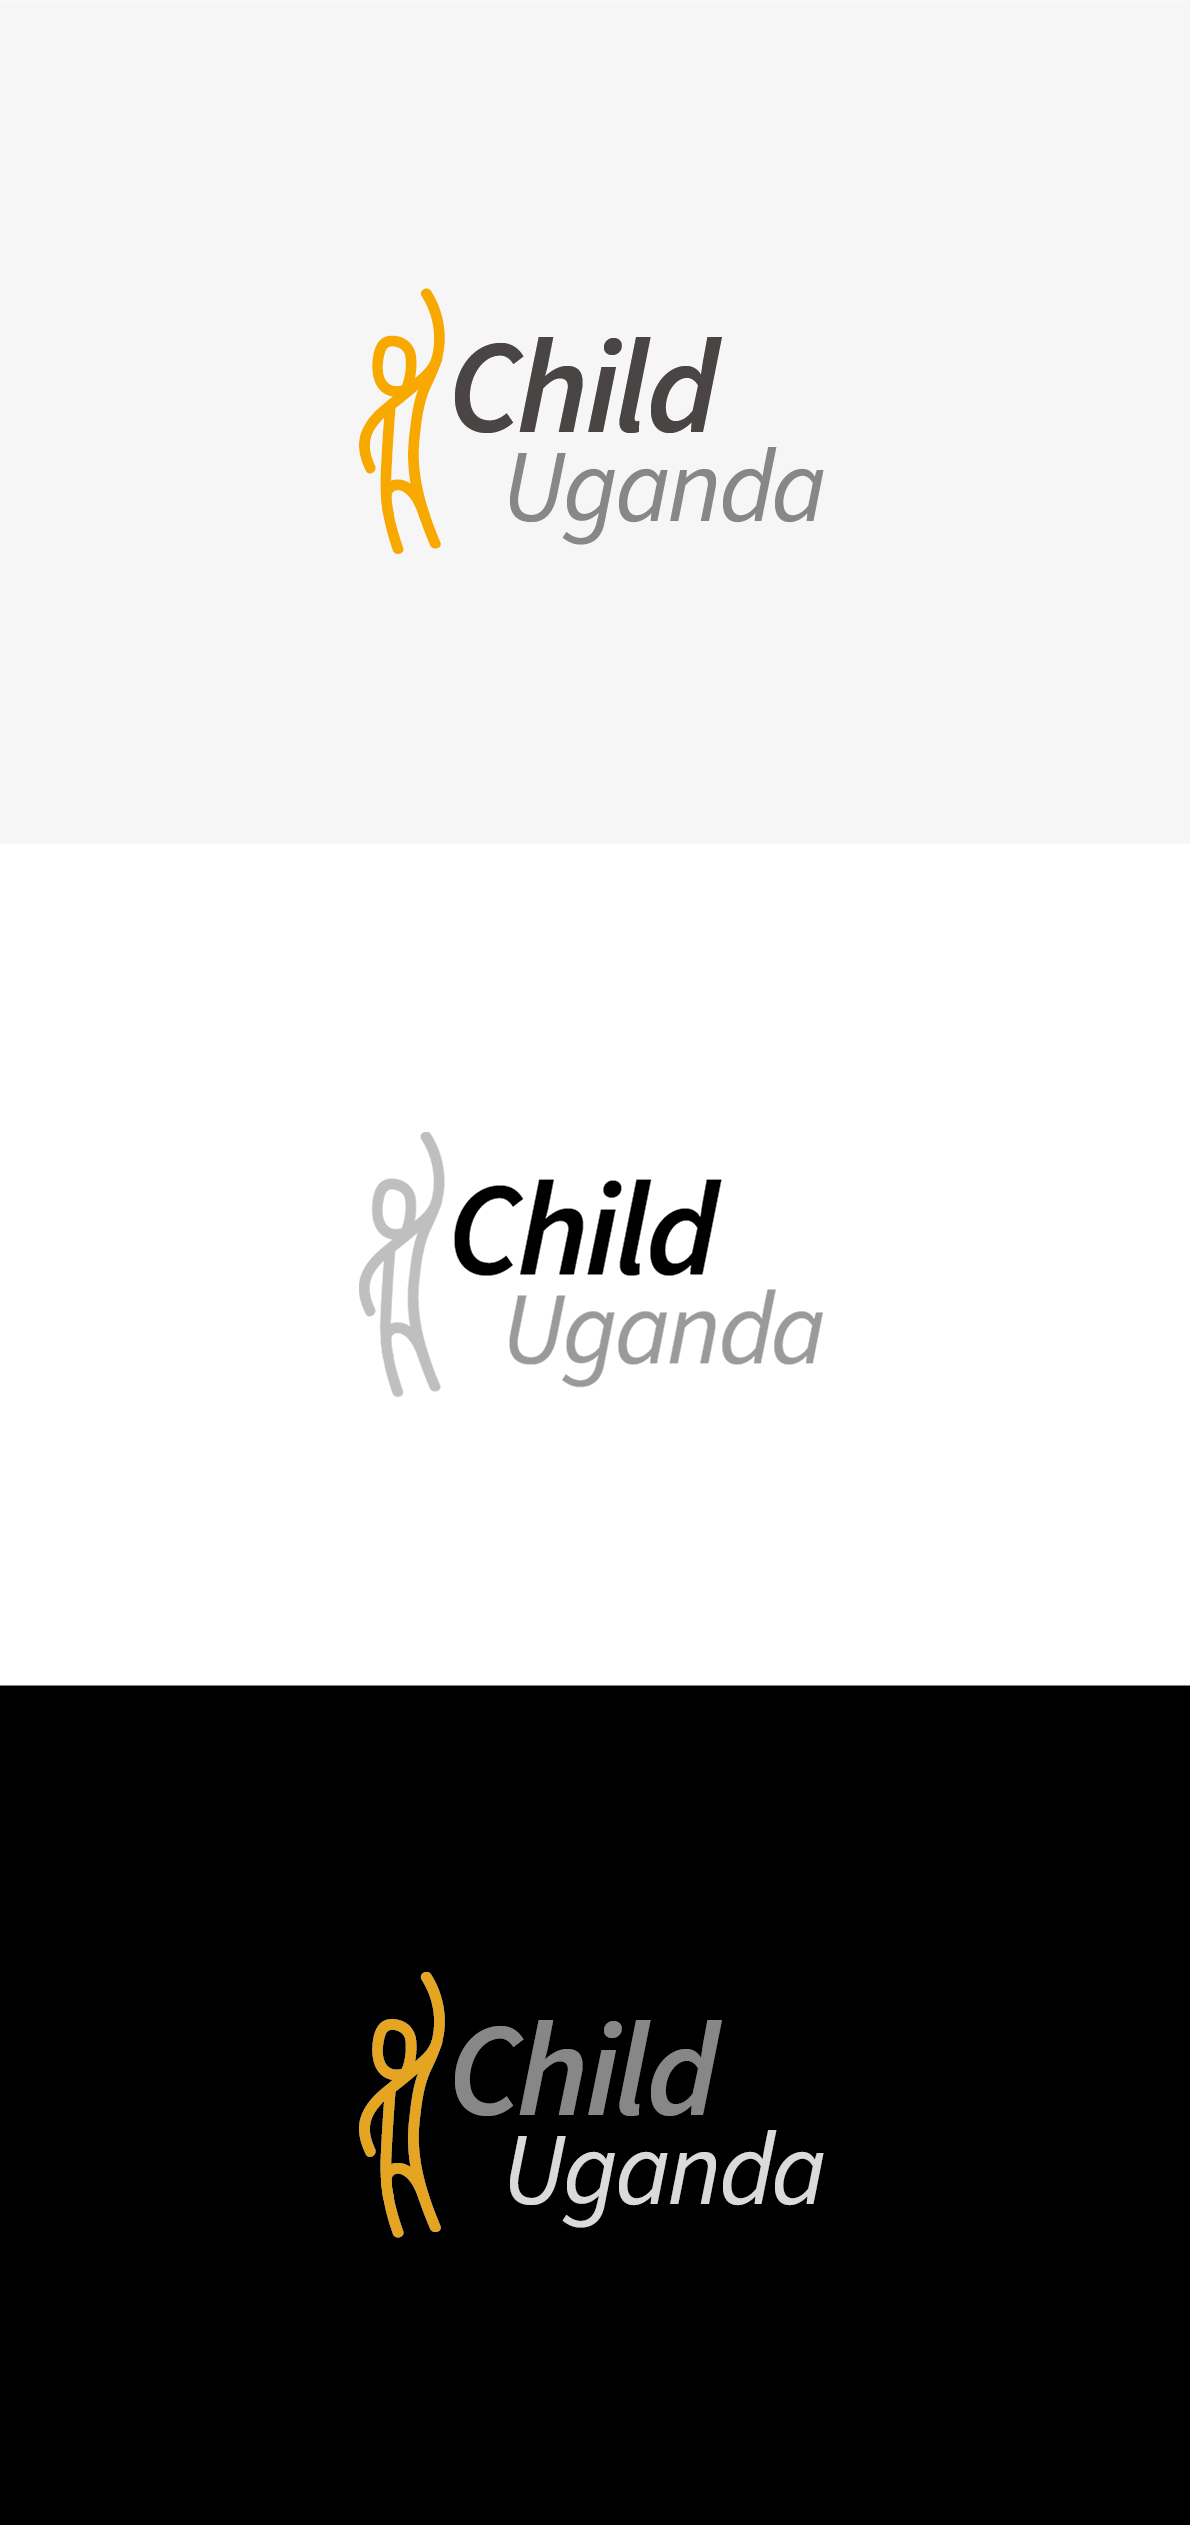 Child Uganda logo